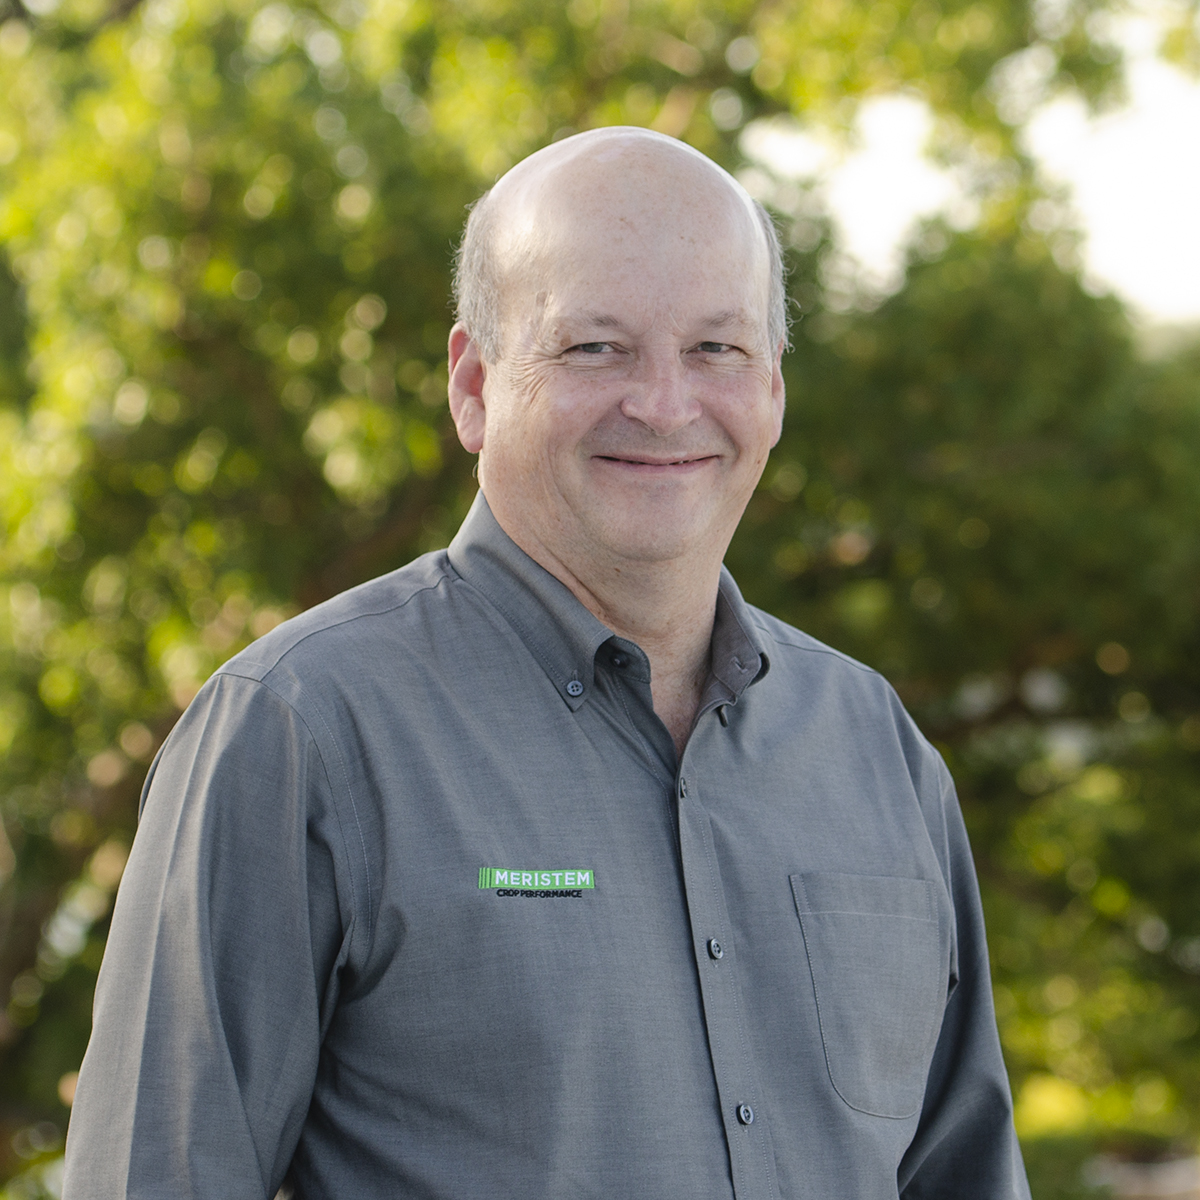 Jeff Troendle